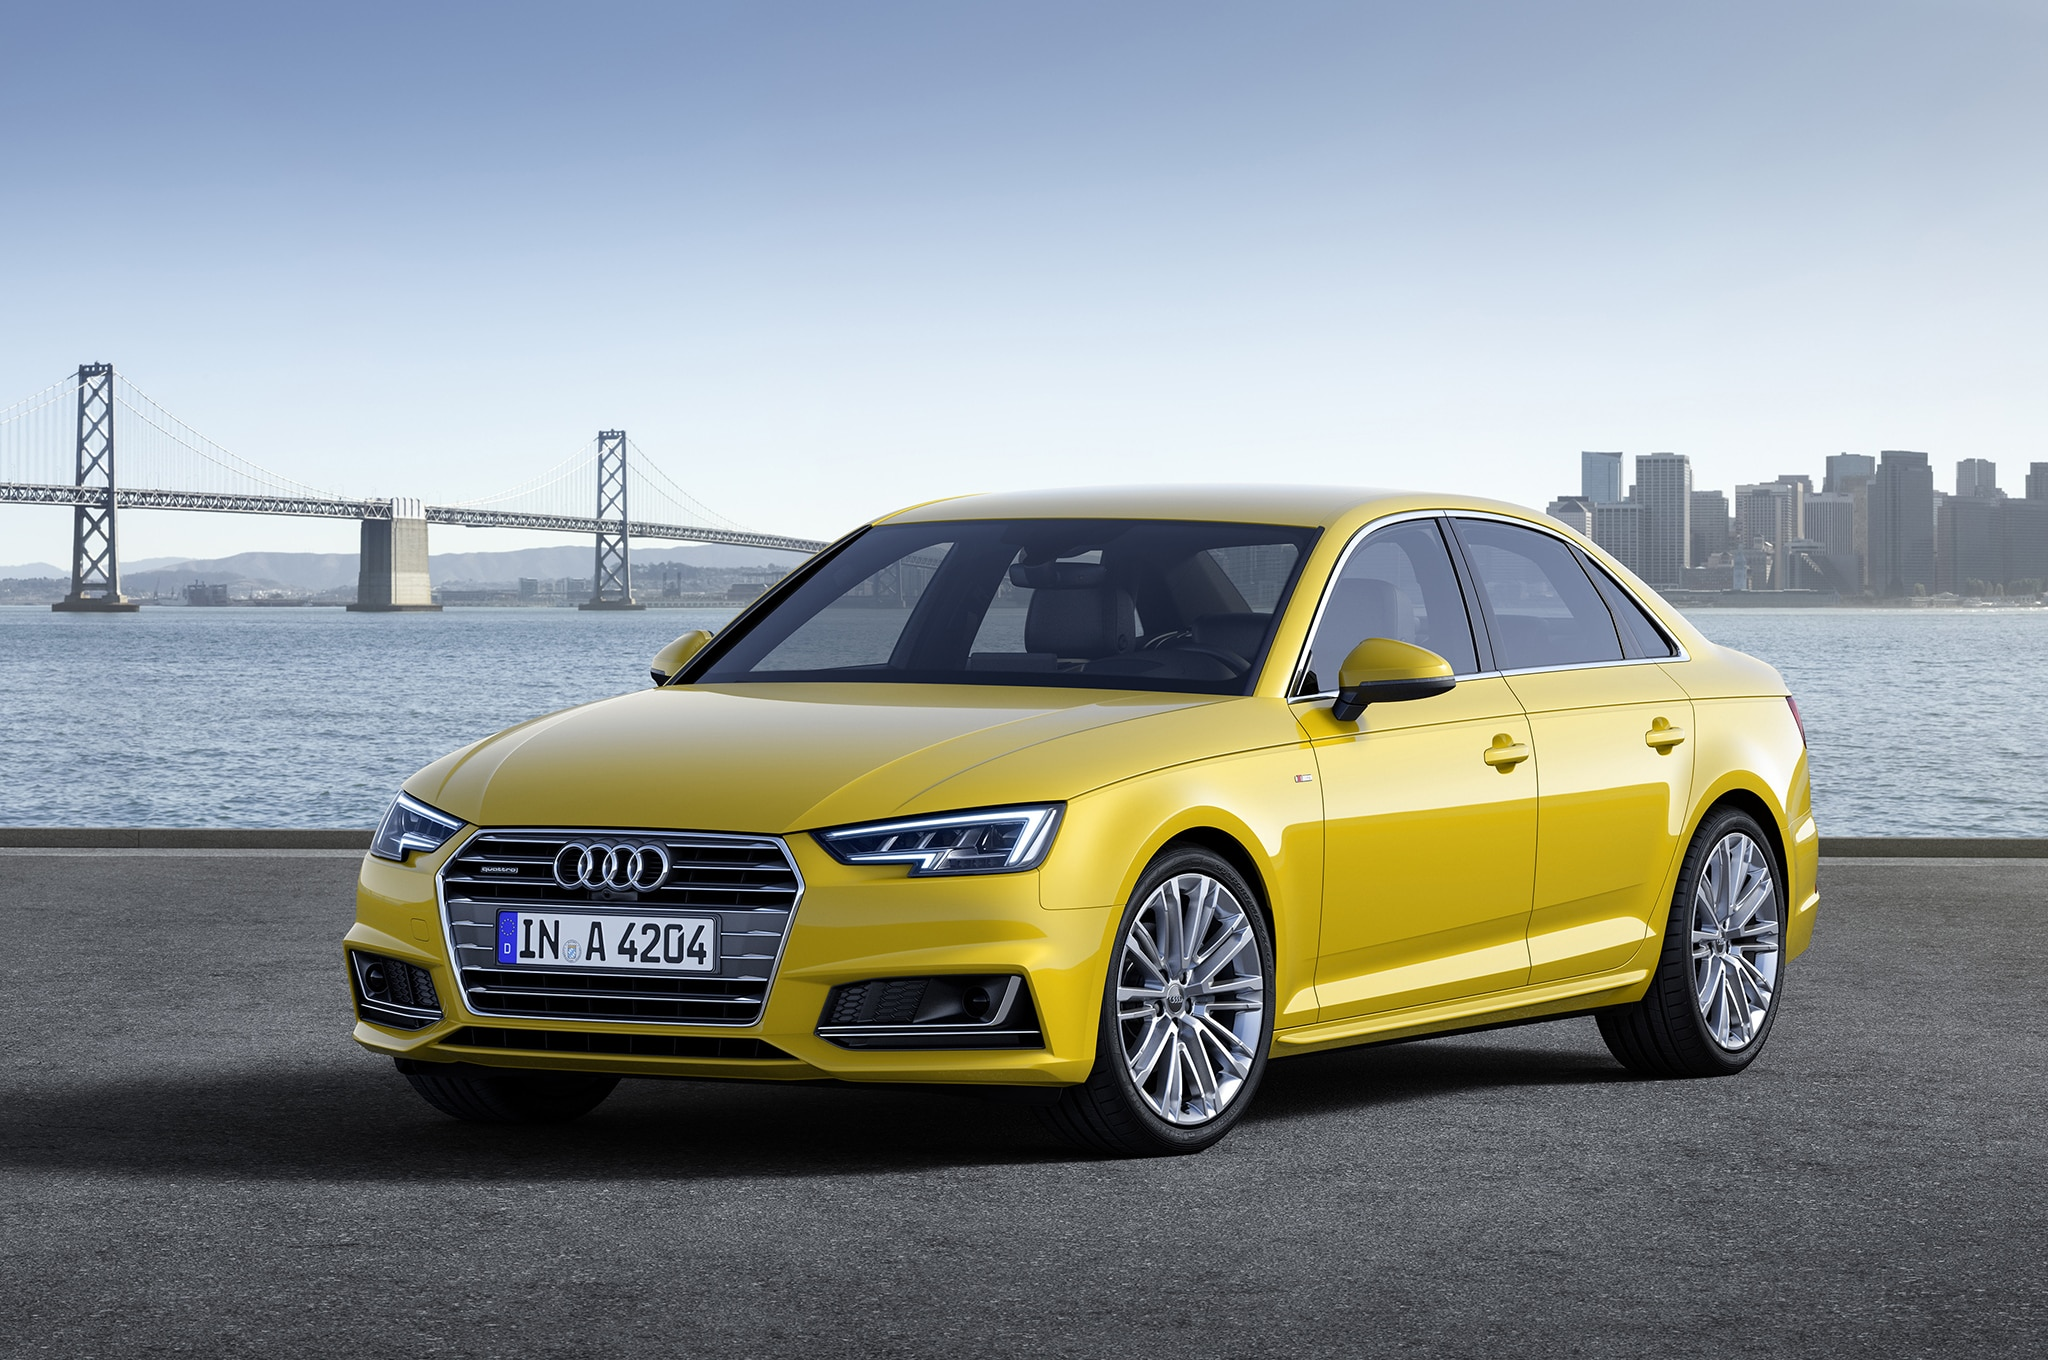 Kekurangan Audi A4 Design Harga